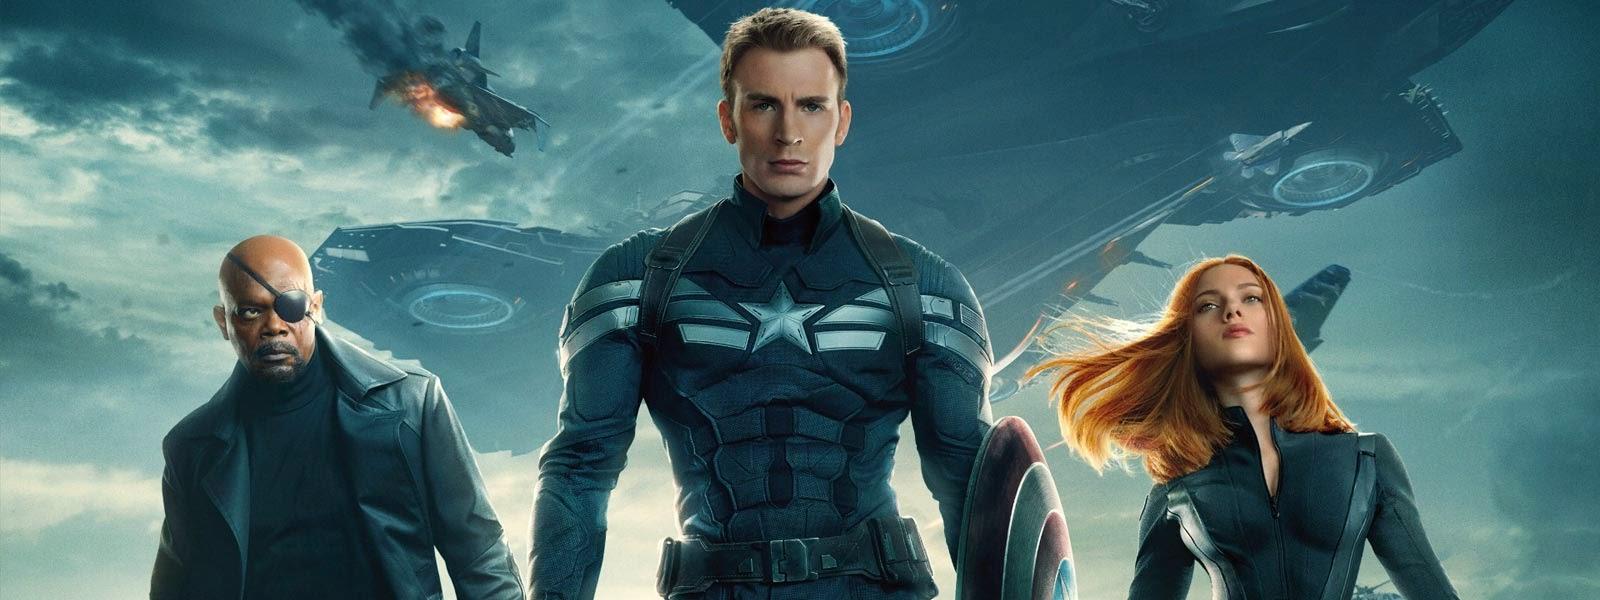 Captain America: Chiến Binh Mùa Đông - Captain America: The Winter Soldier (2014)